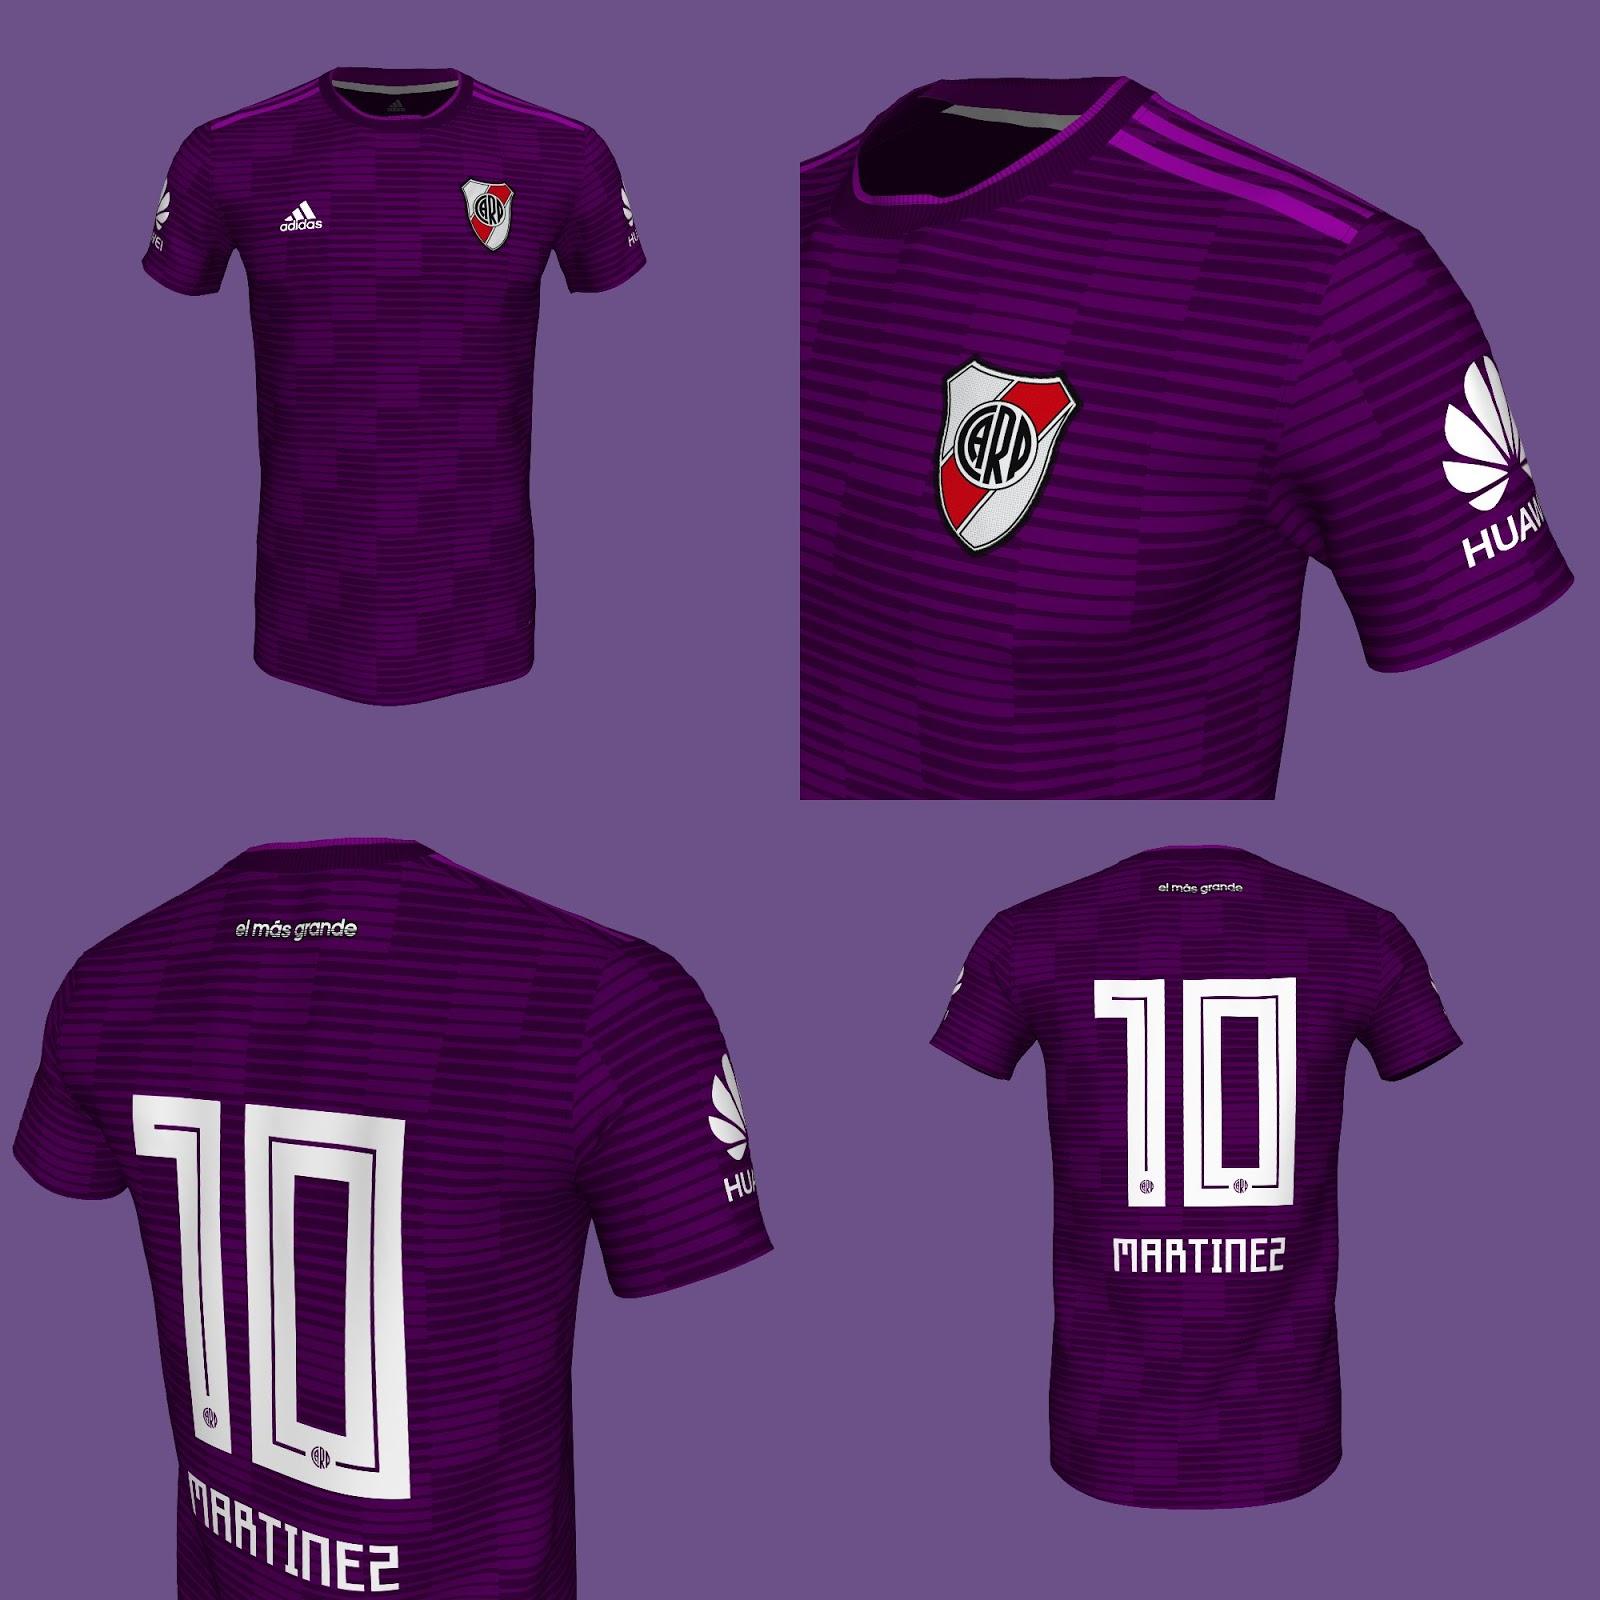 Nueva Camiseta River River Plate Suplente  Violeta